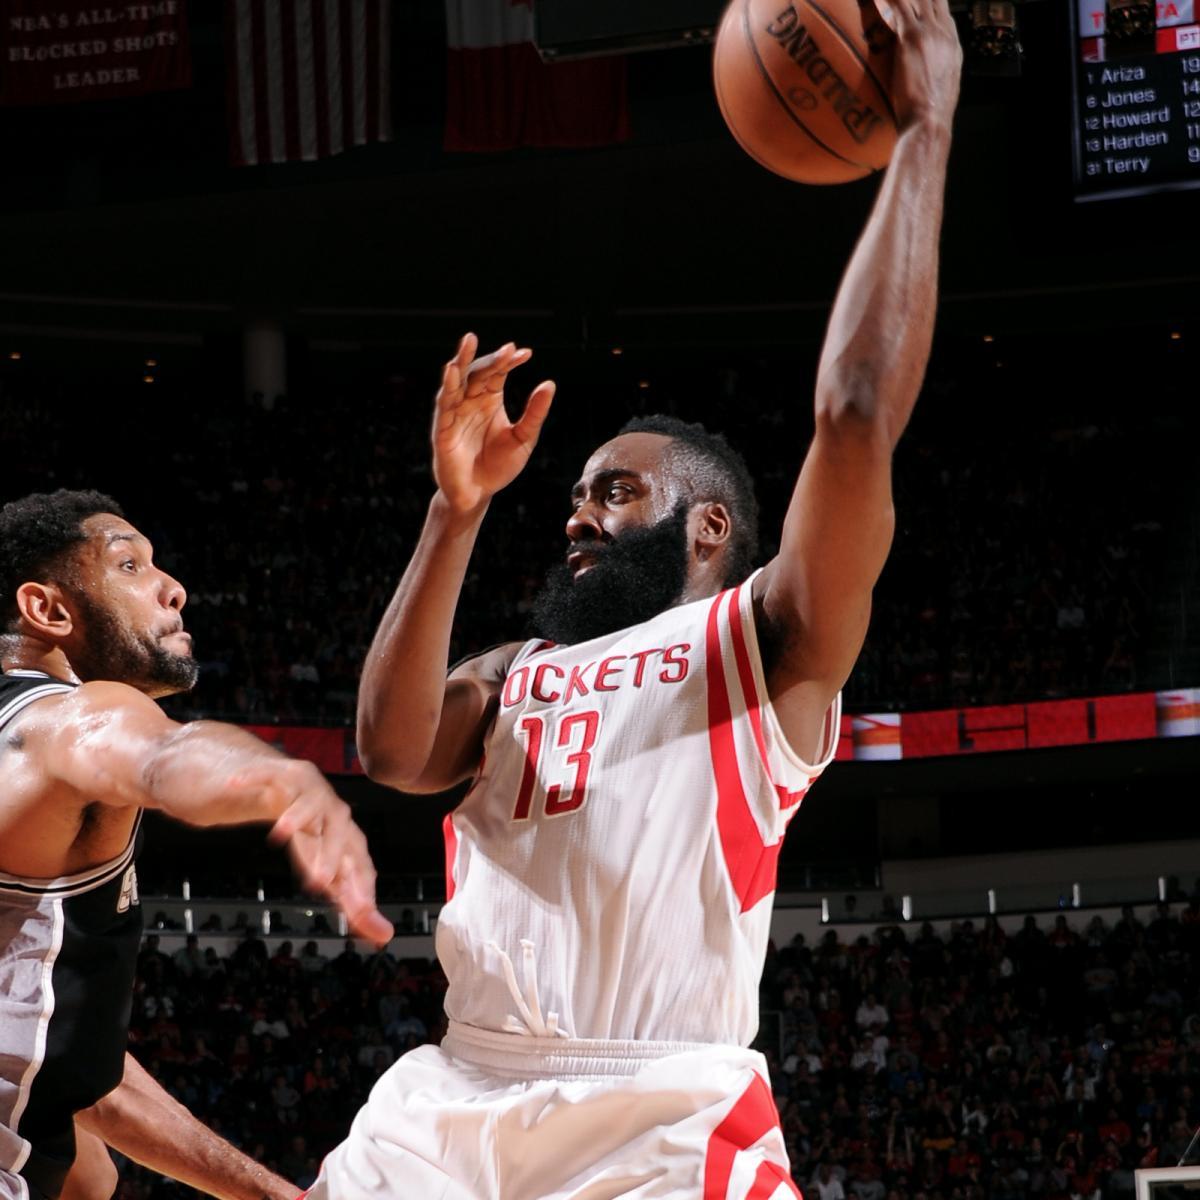 Houston Rockets Win Last Night: San Antonio Spurs Vs. Houston Rockets 4/10/15: Video